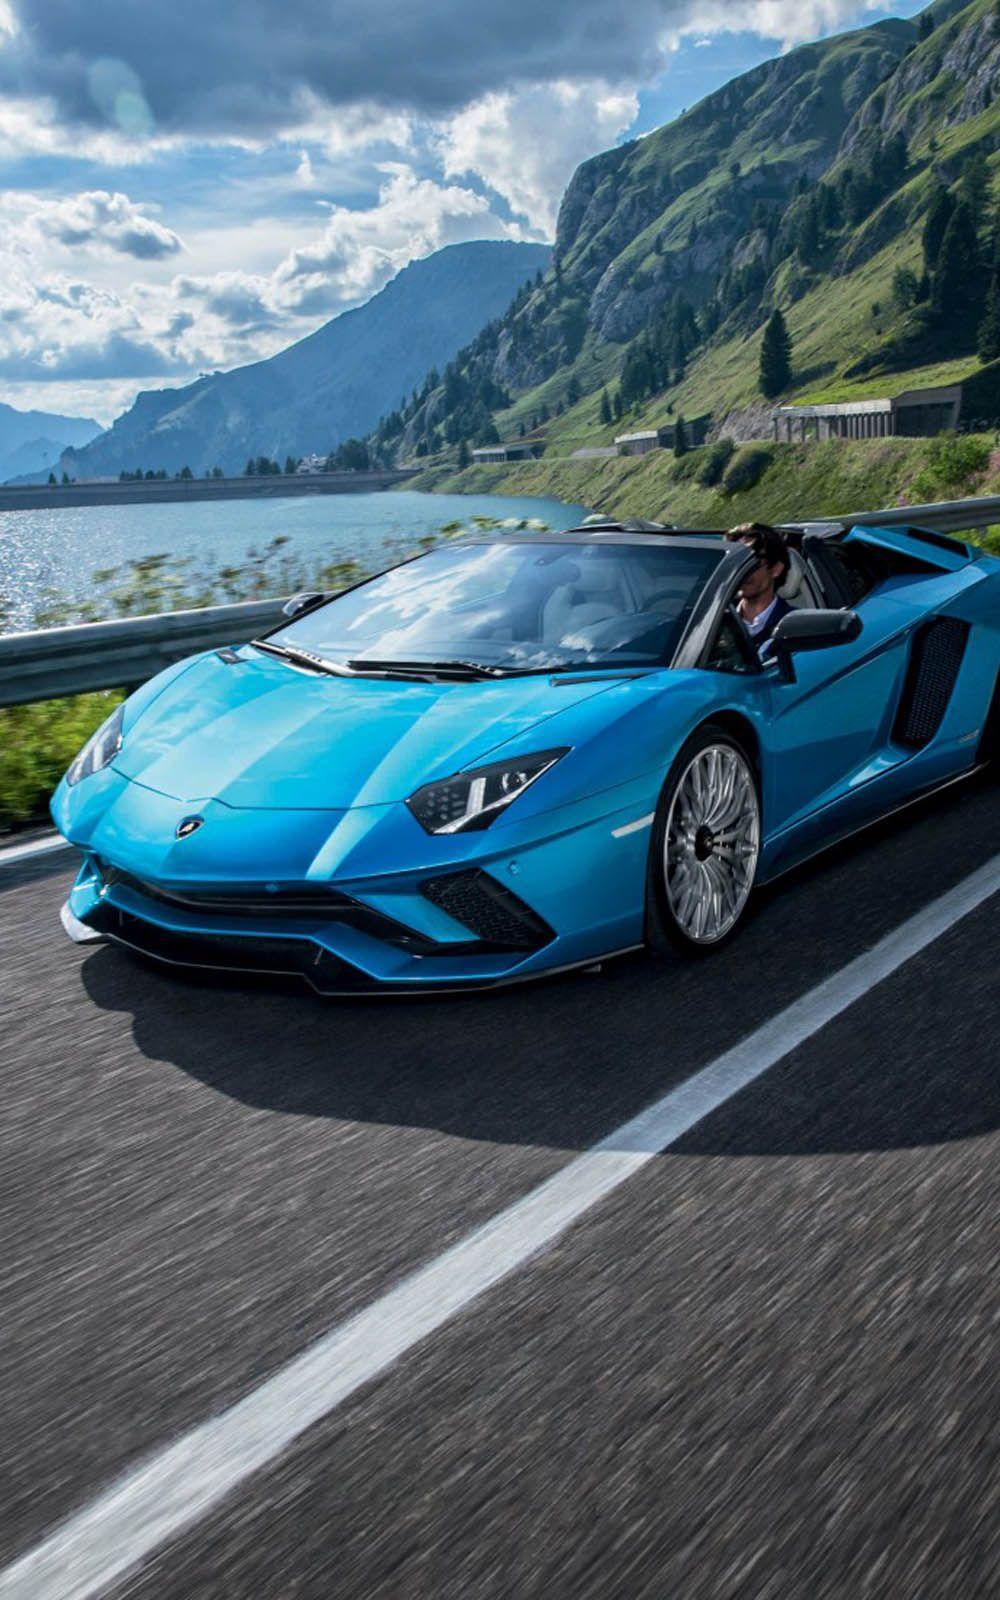 Blue Lamborghini Iphone Wallpapers Top Free Blue Lamborghini Iphone Backgrounds Wallpaperaccess